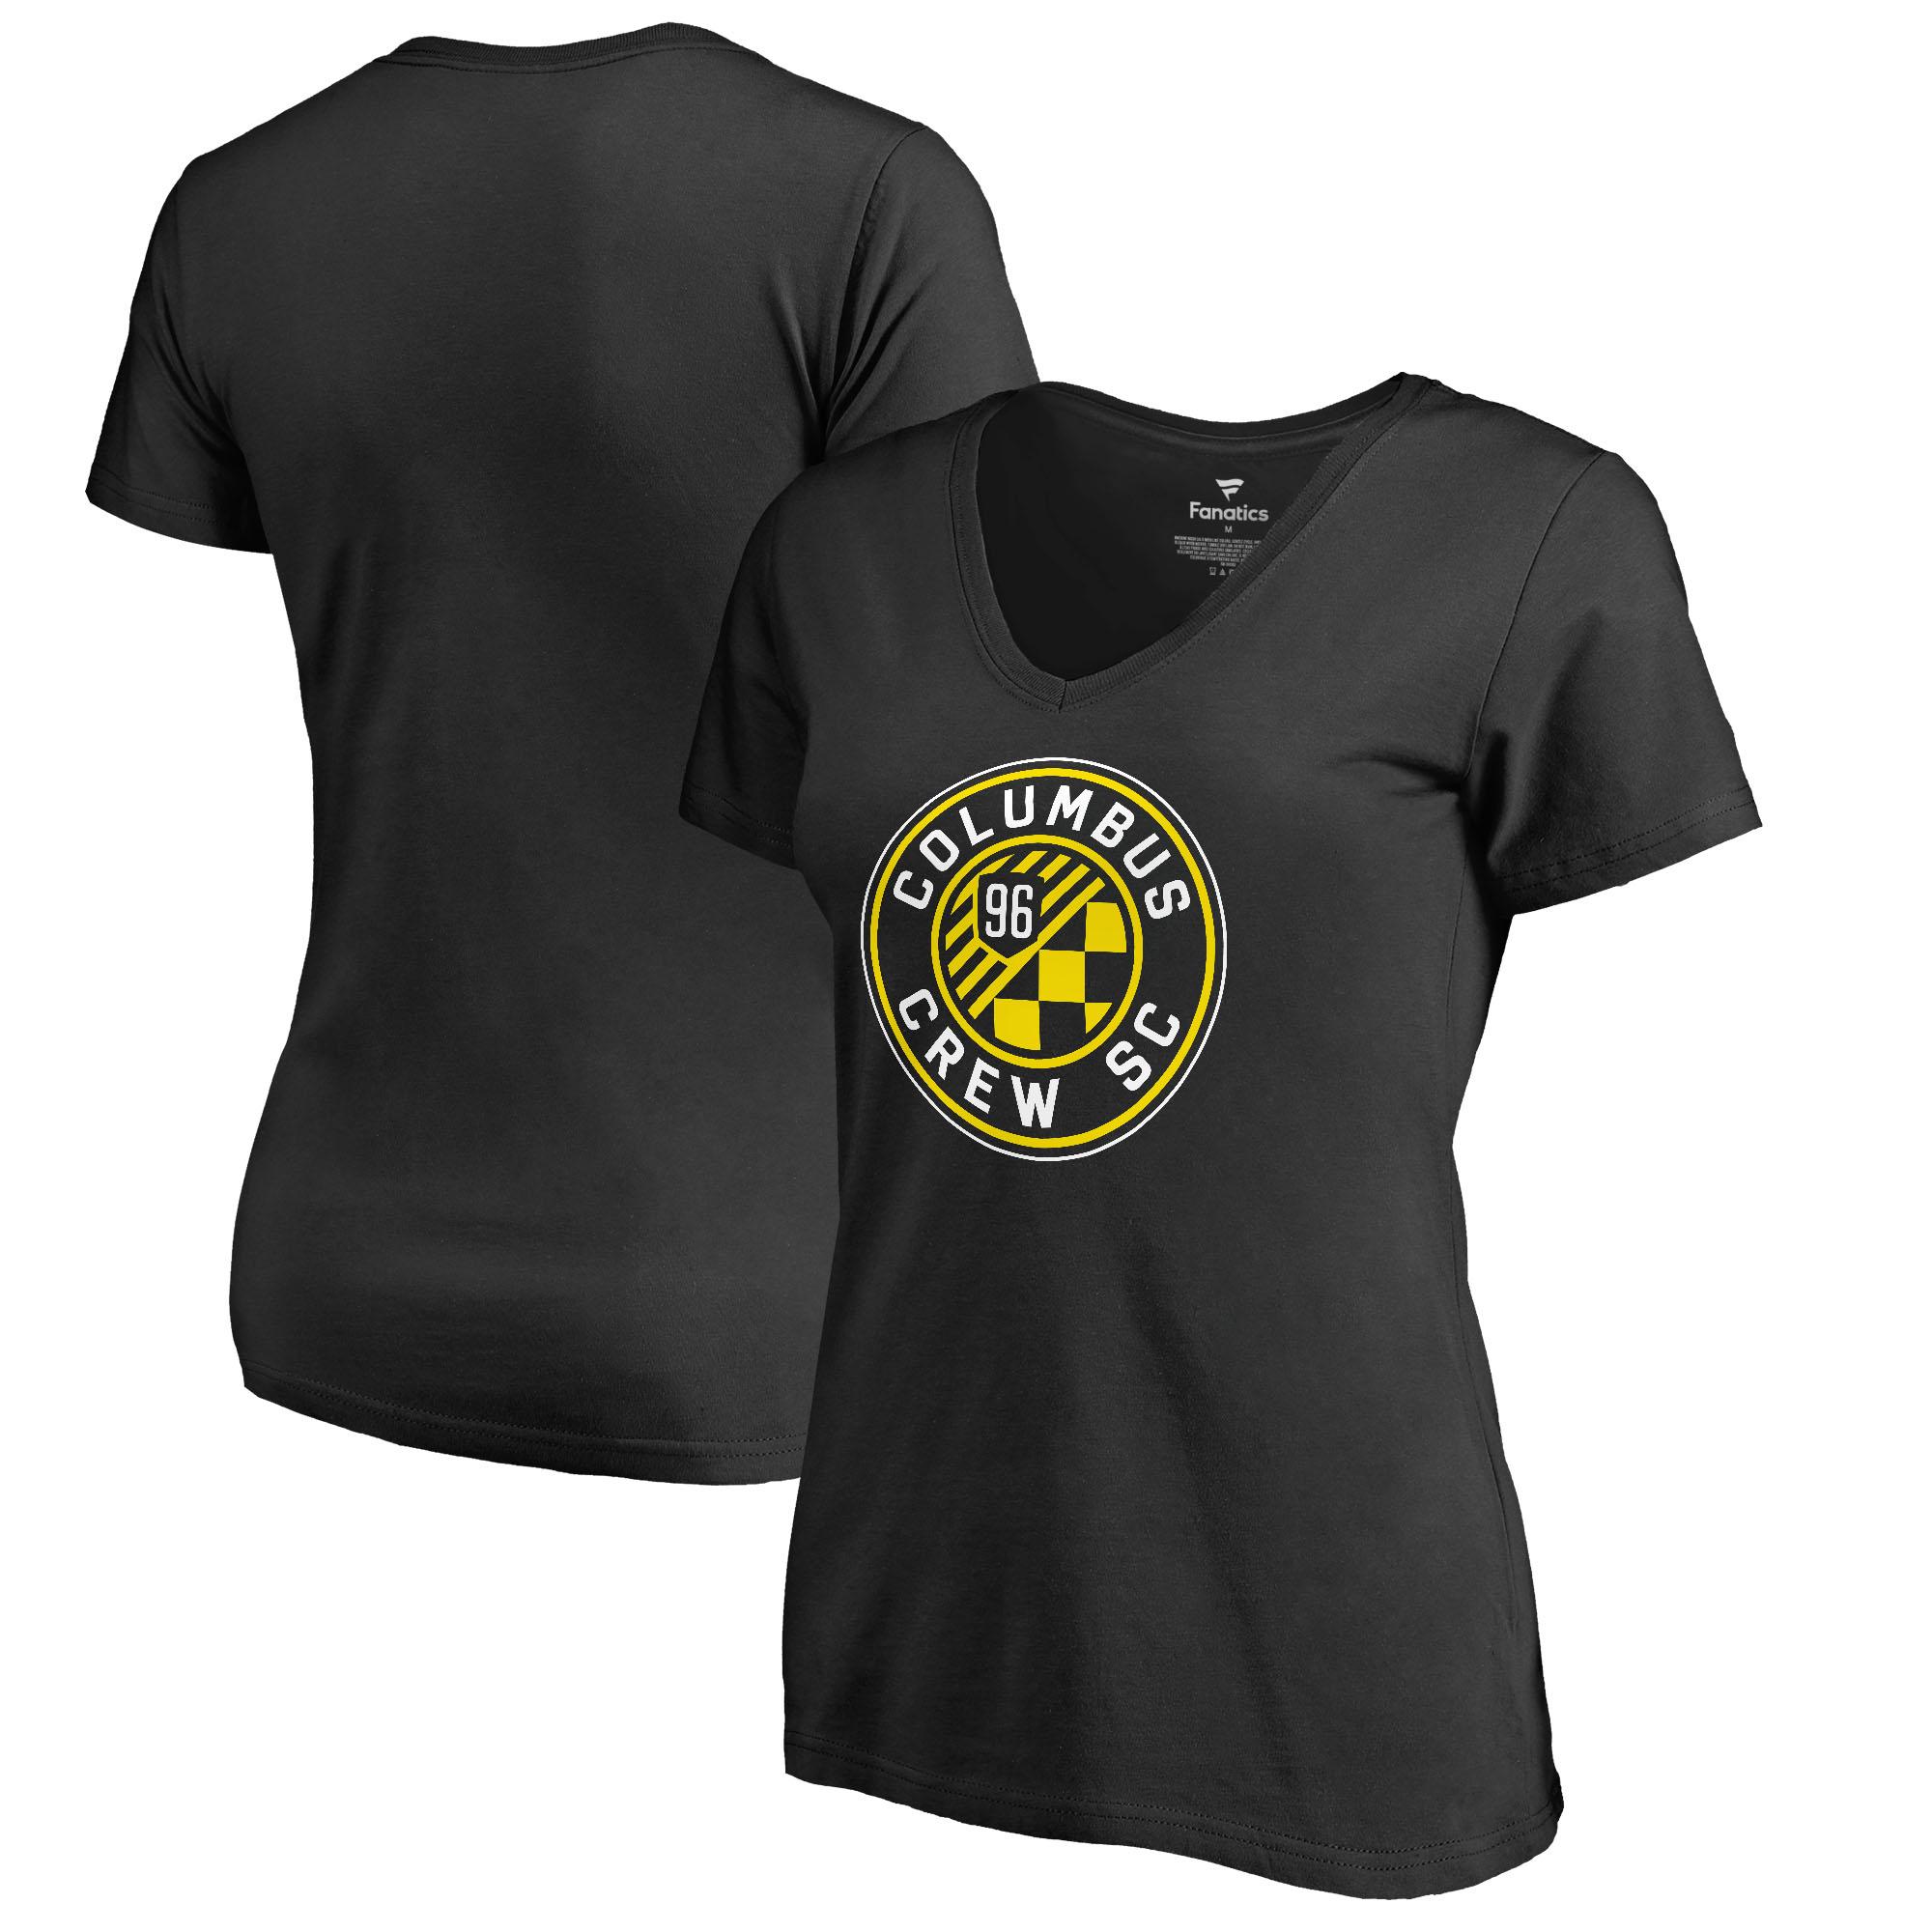 Columbus Crew SC Fanatics Branded Women's Primary Logo V-Neck T-Shirt - Black